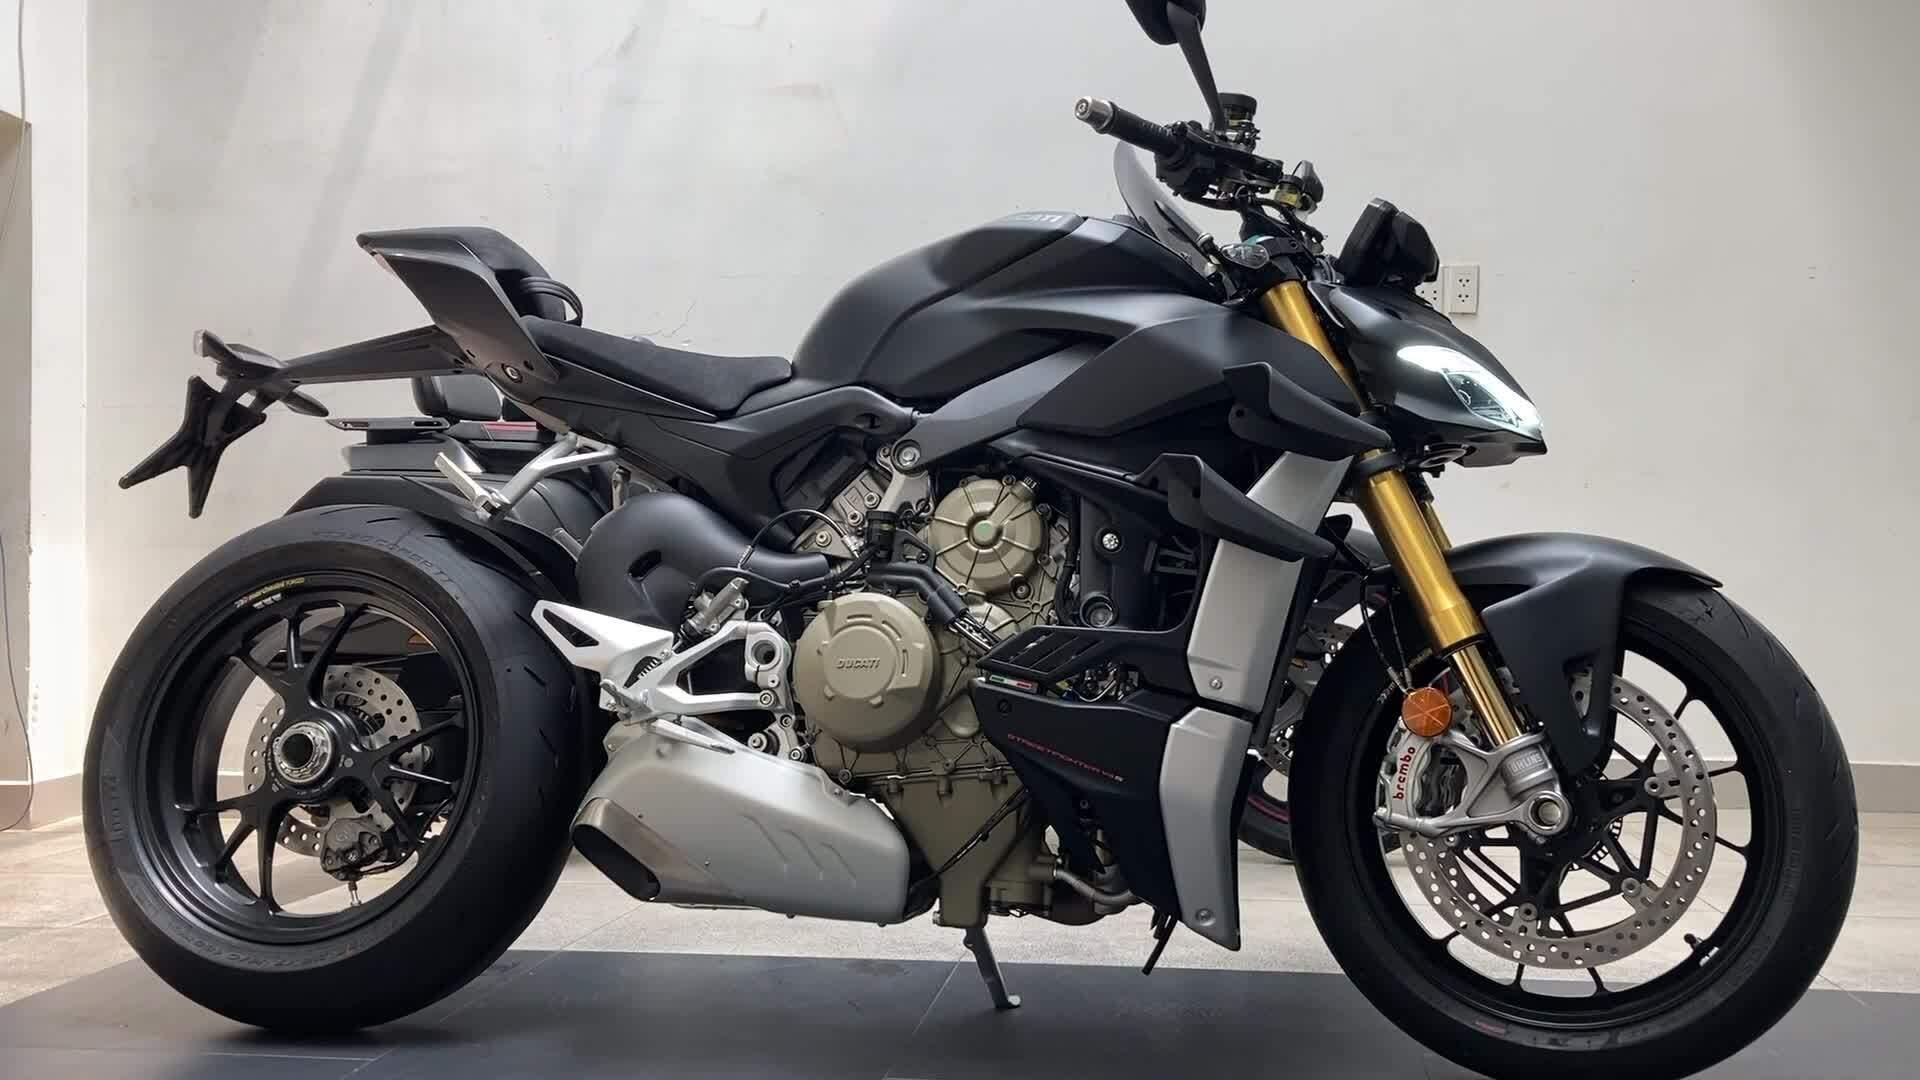 Ducati Streetfighter V4S - nakedbike mạnh 208 mã lực về Việt Nam